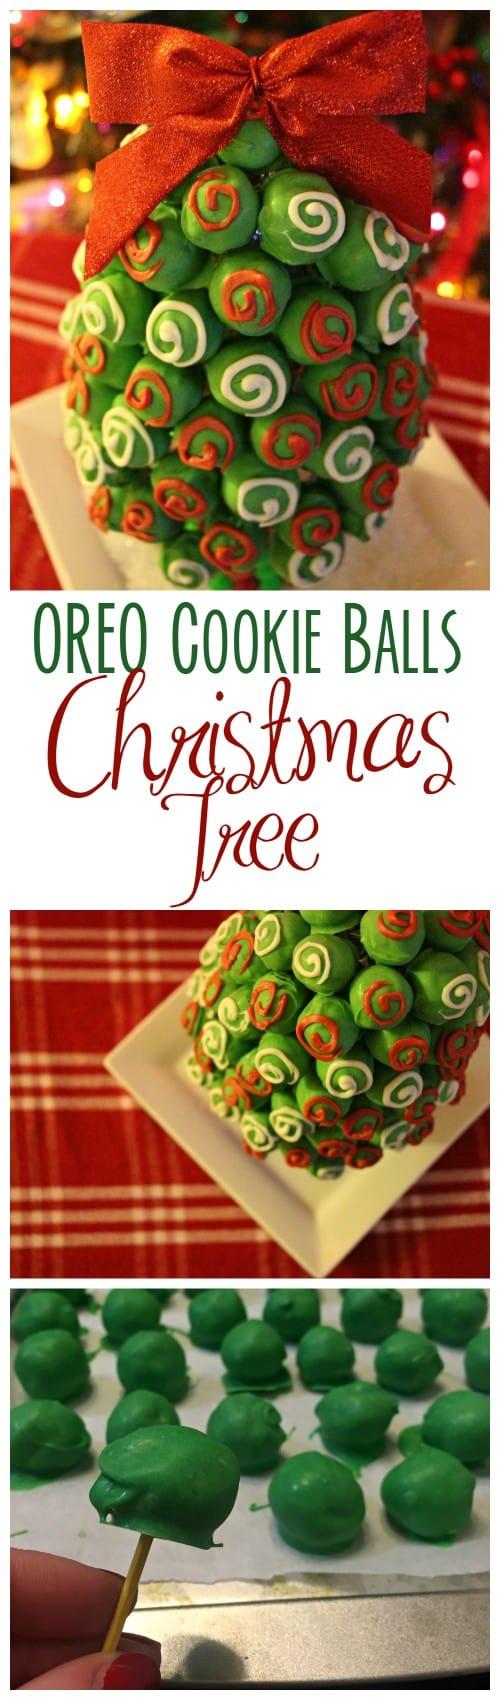 OREO-Cookie-Balls-Christmas-Tree-Collage